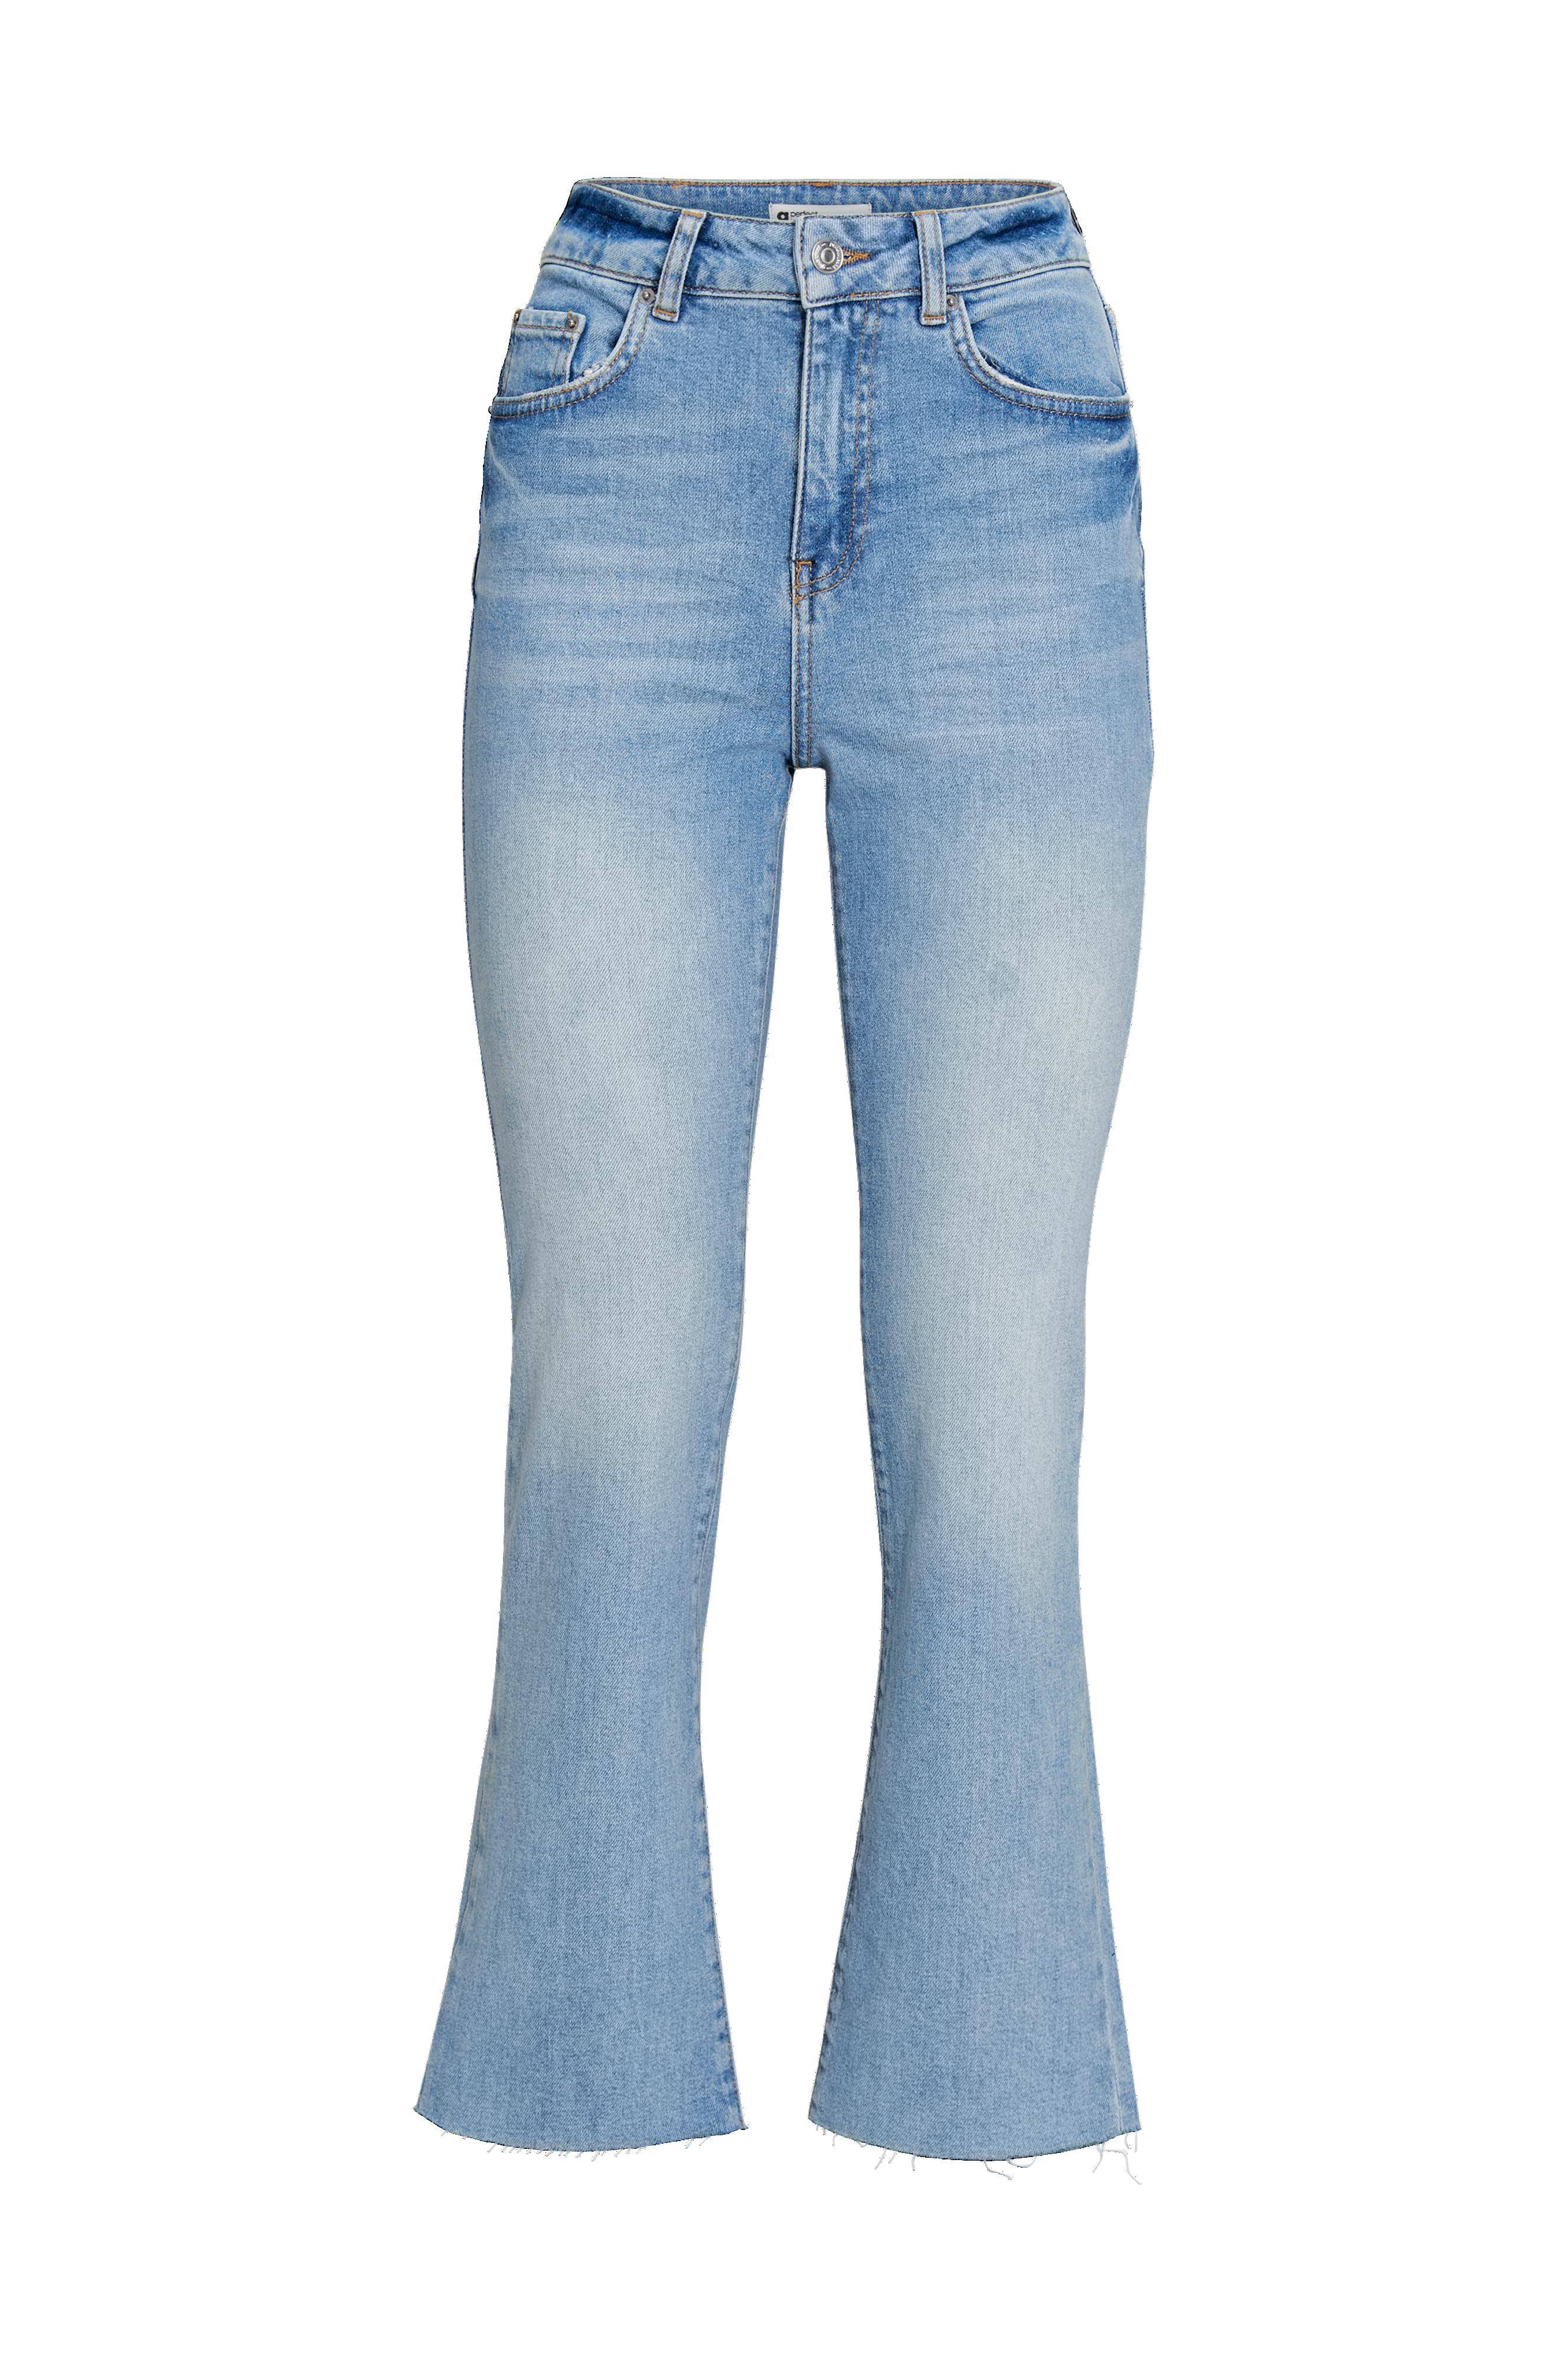 Gina Tricot Jeans Kick Flare Blå Bootcut Ellos.no